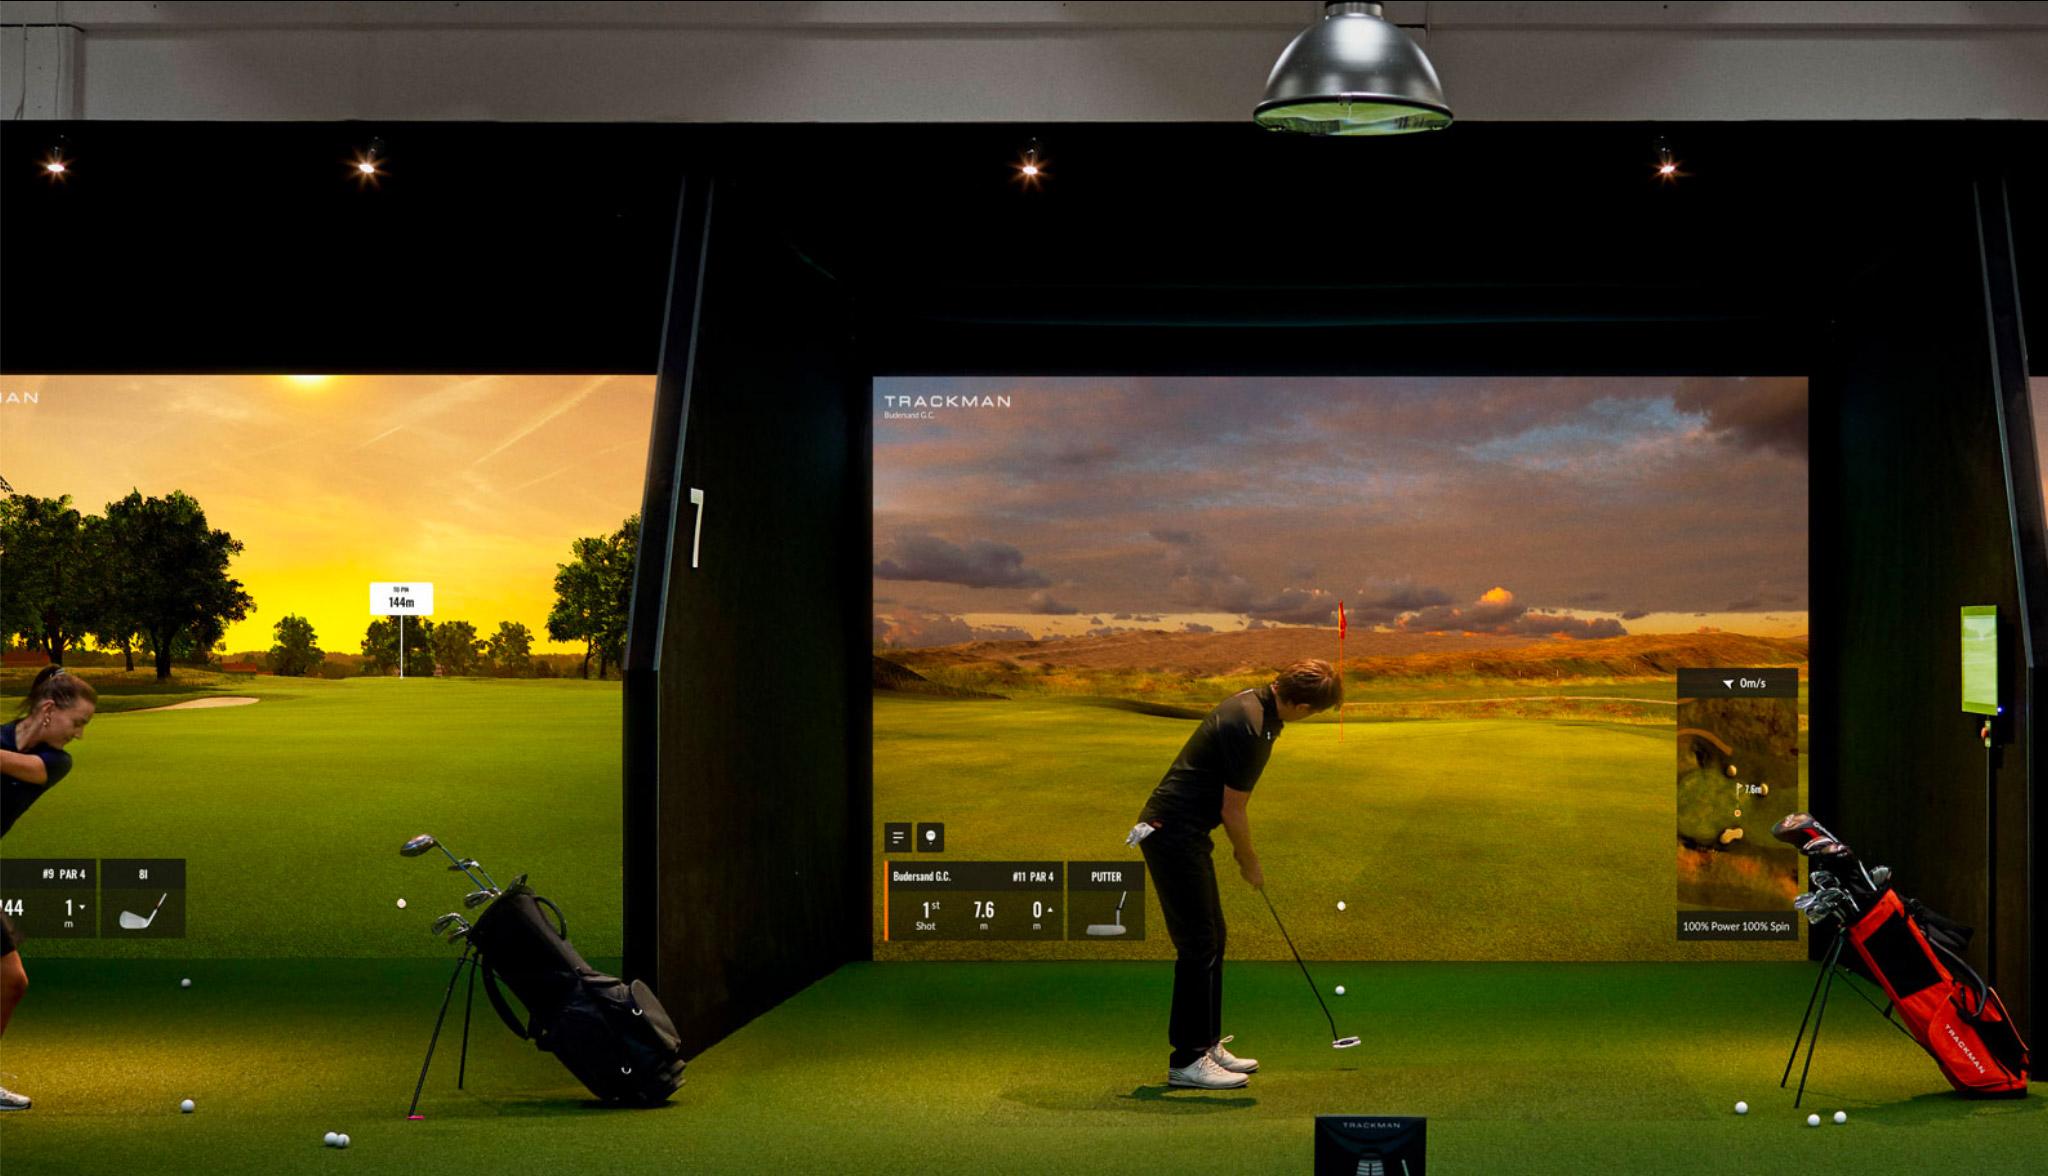 Trackman Golfsimulator